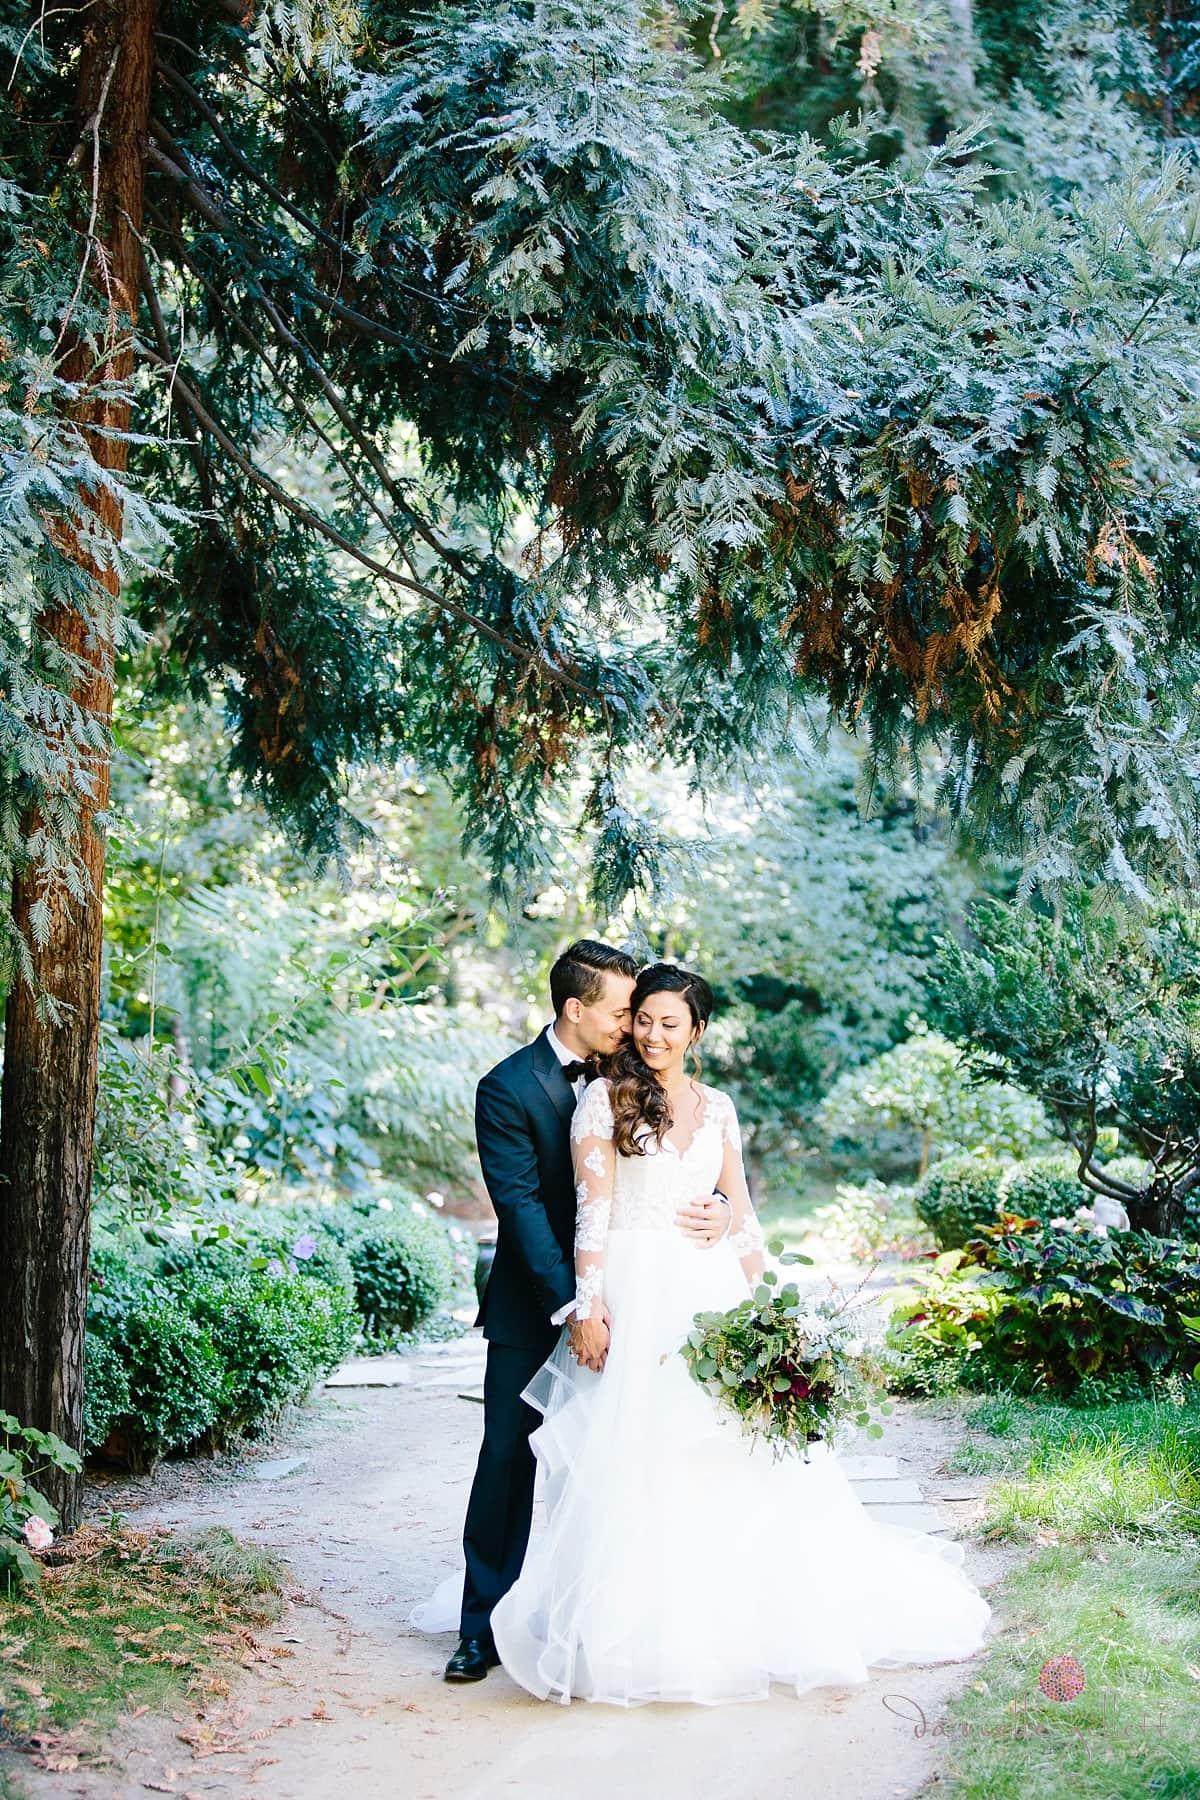 Nesldown Wedding, Danielle Gillett Photography, Whimsical Wedding, Bohemian Wedding, Bay Area Wedding, Fairytale wedding, Santa Cruz Wedding, Redwood Wedding, Bride and Groom, First Look